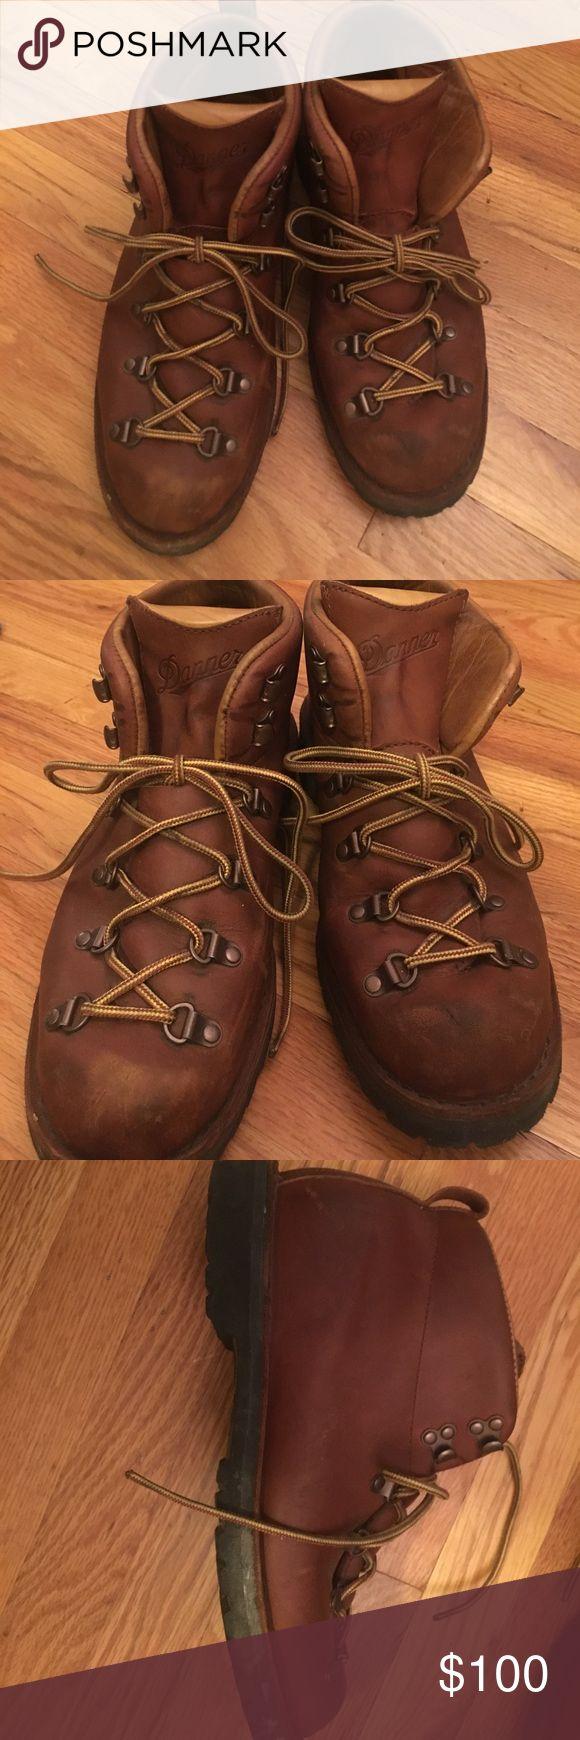 Best 20  Danner boots ideas on Pinterest | Danner hiking boots ...